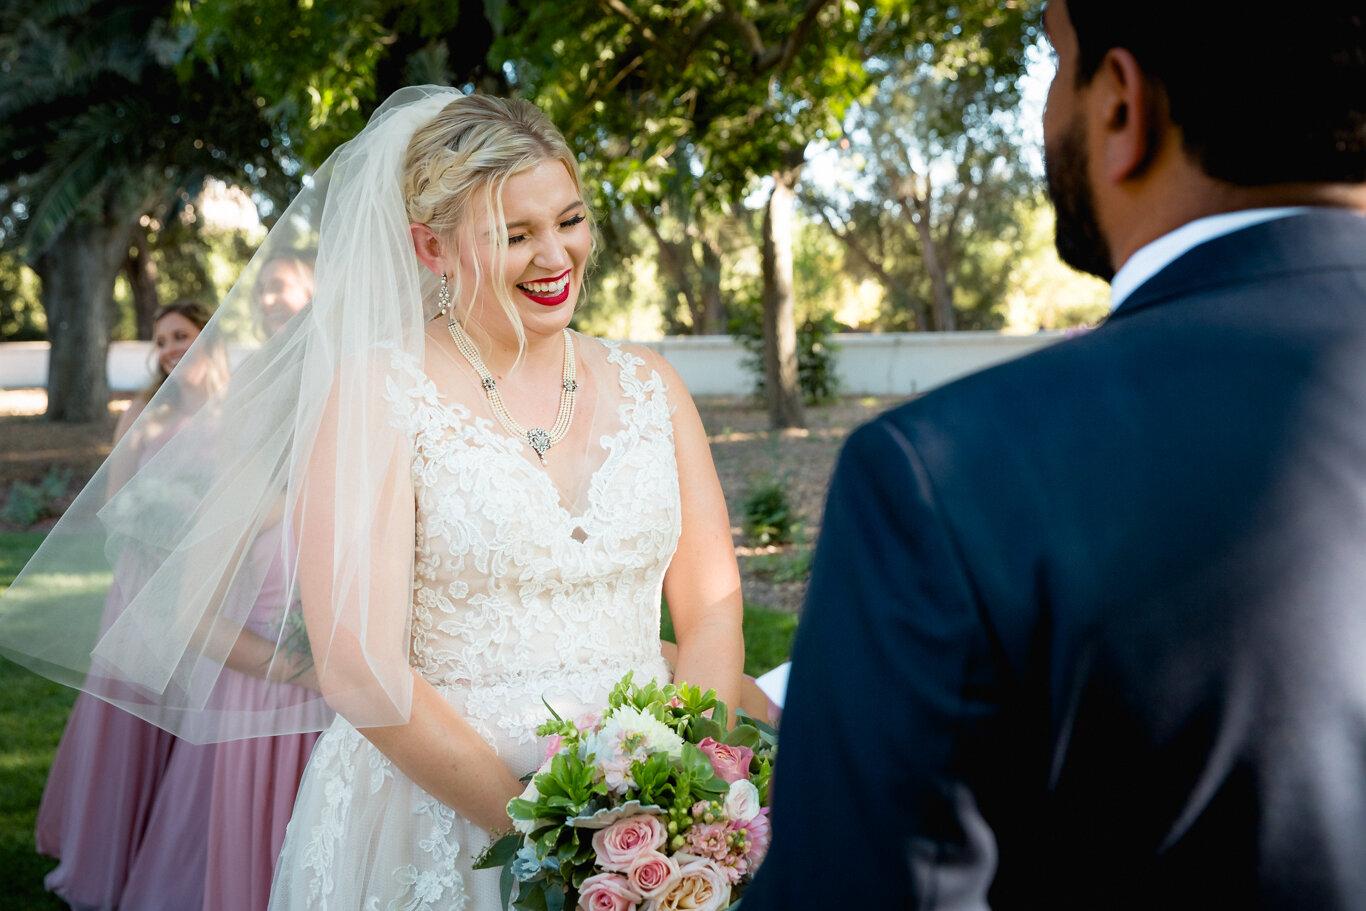 2019.08.24_Emily-Ashir-Wedding-at-the-Maples-5871.jpg